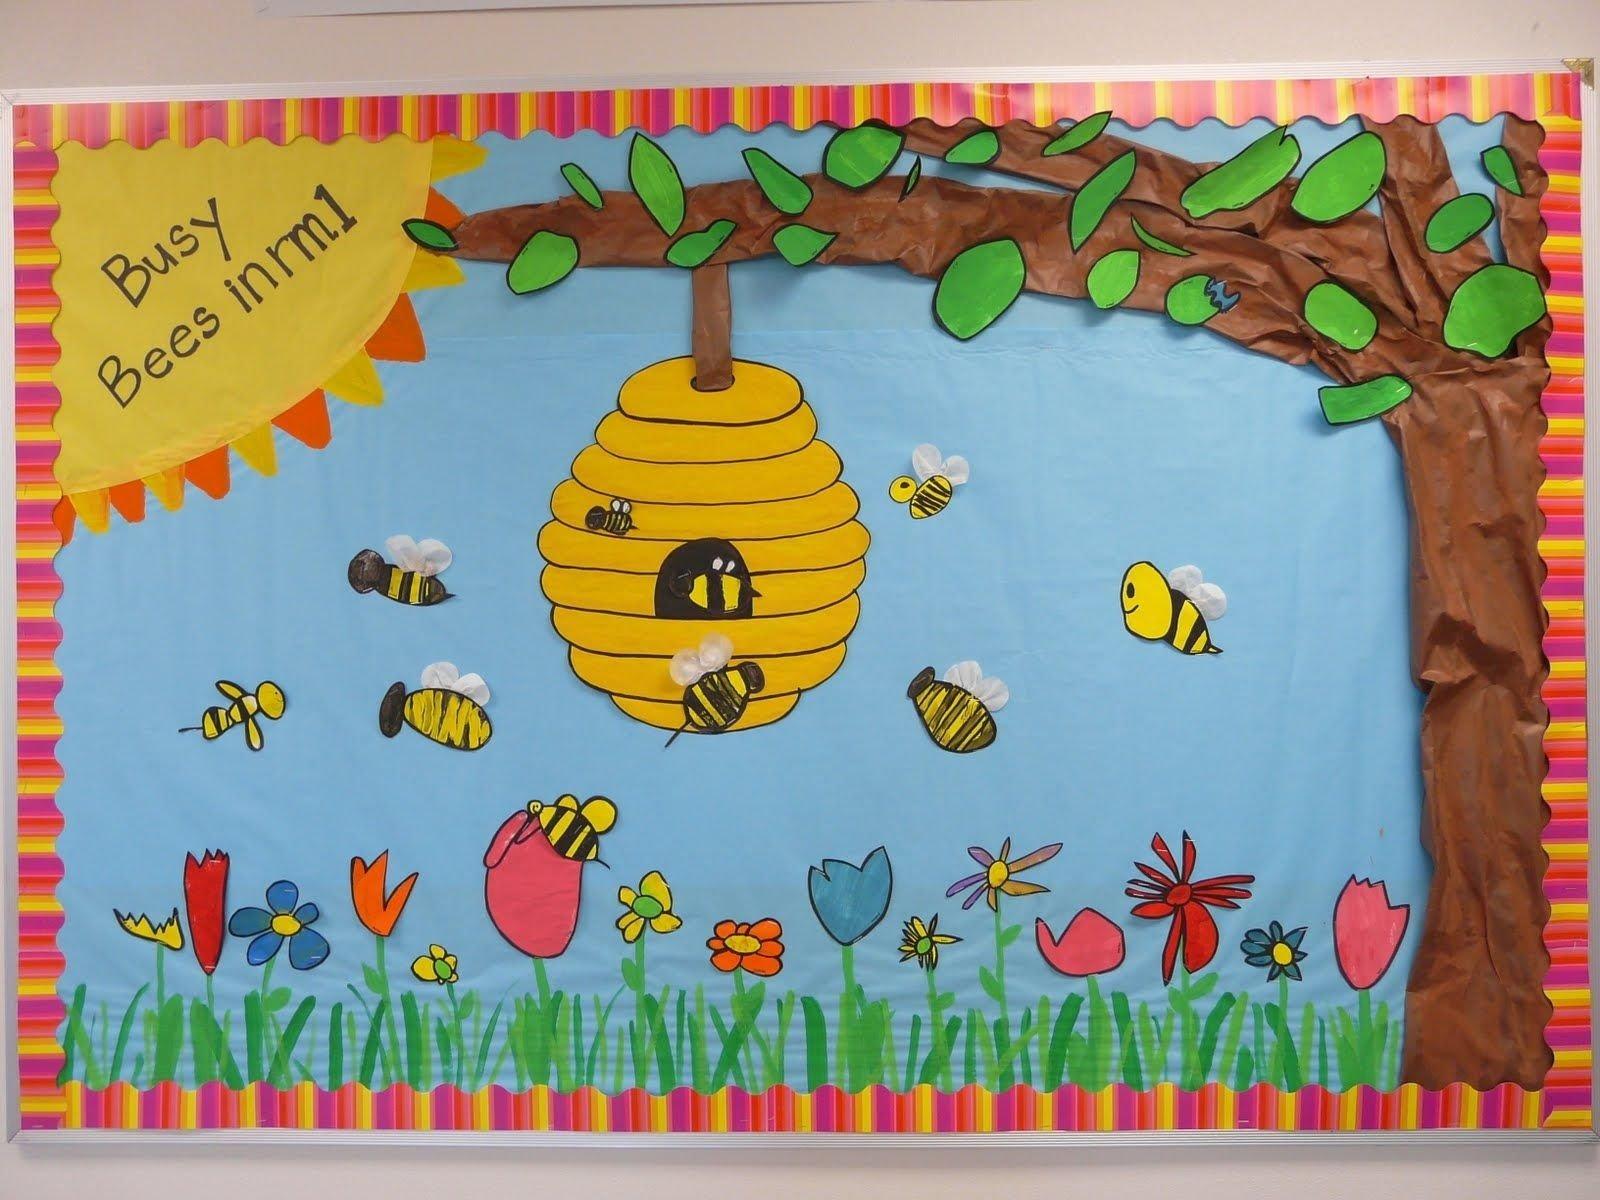 10 Attractive Spring Bulletin Board Ideas Preschool spring bulletin board ideas postedbulletin boards at 1004 am 4 2021